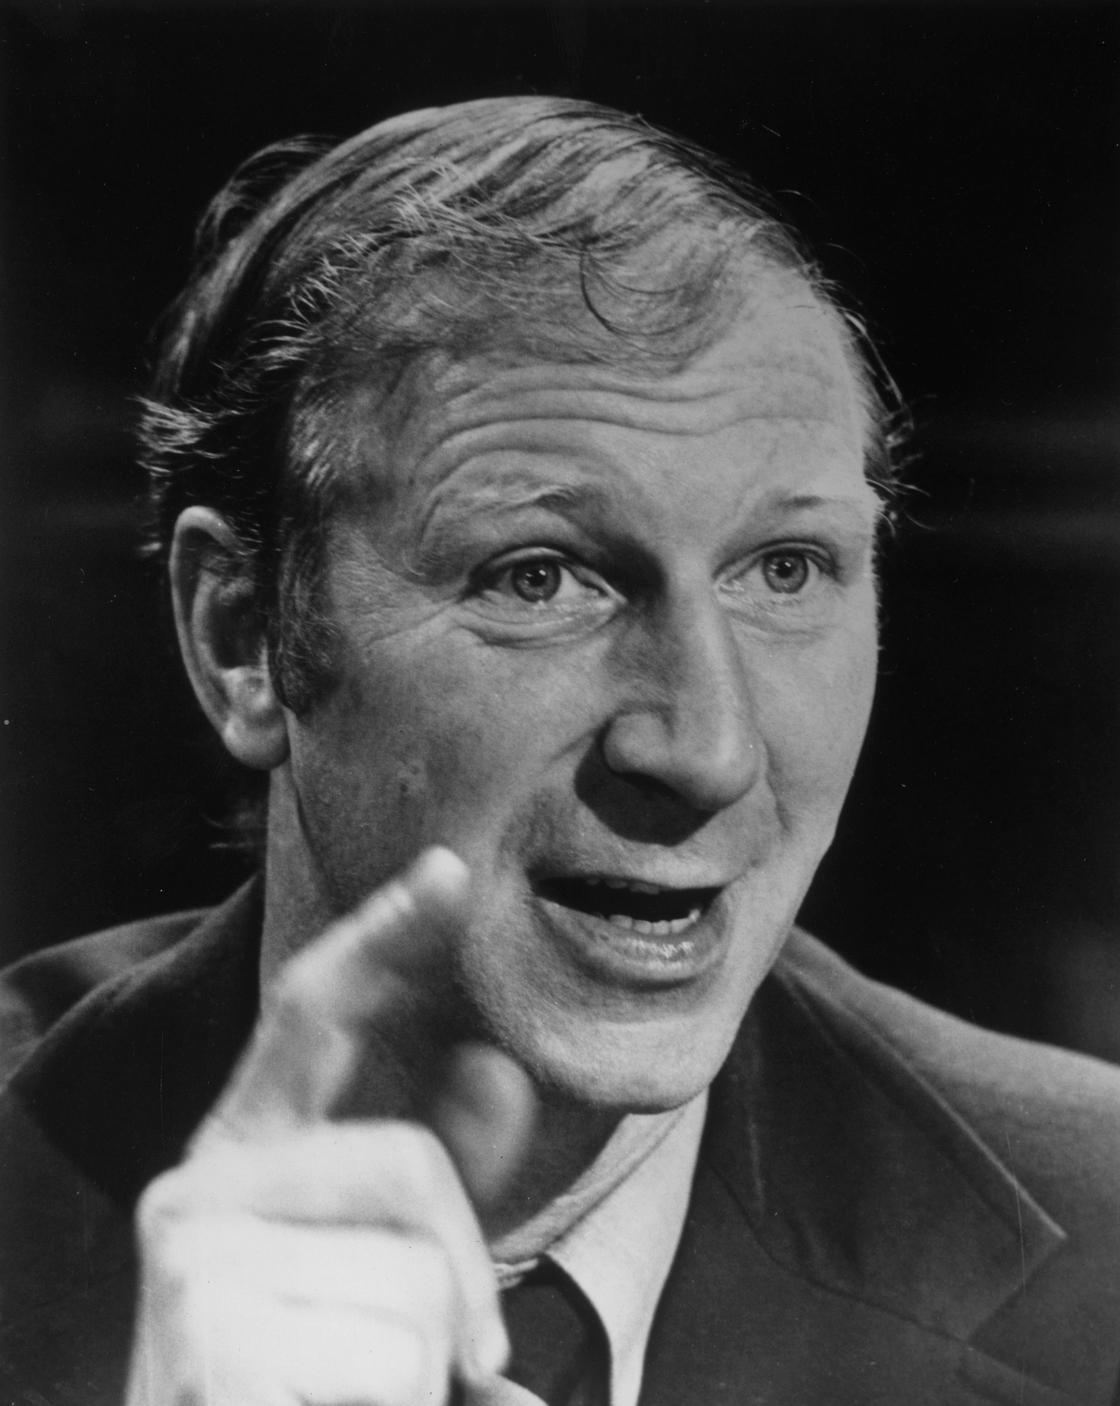 Image - Charlton in January 1979